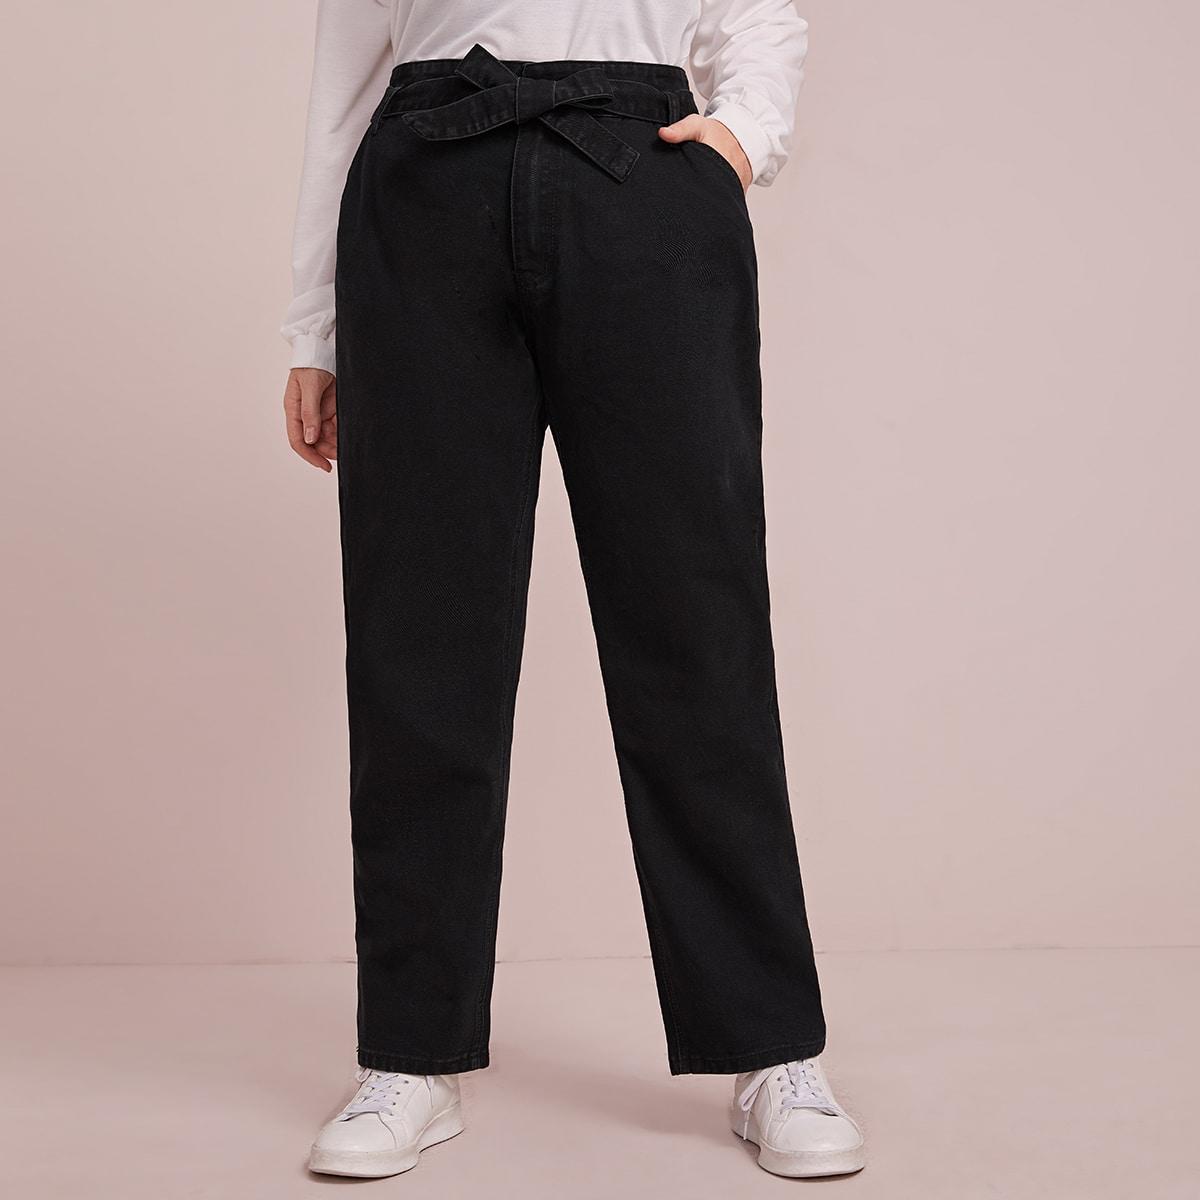 Zwart Casual Vlak Grote maten: jeans Zak